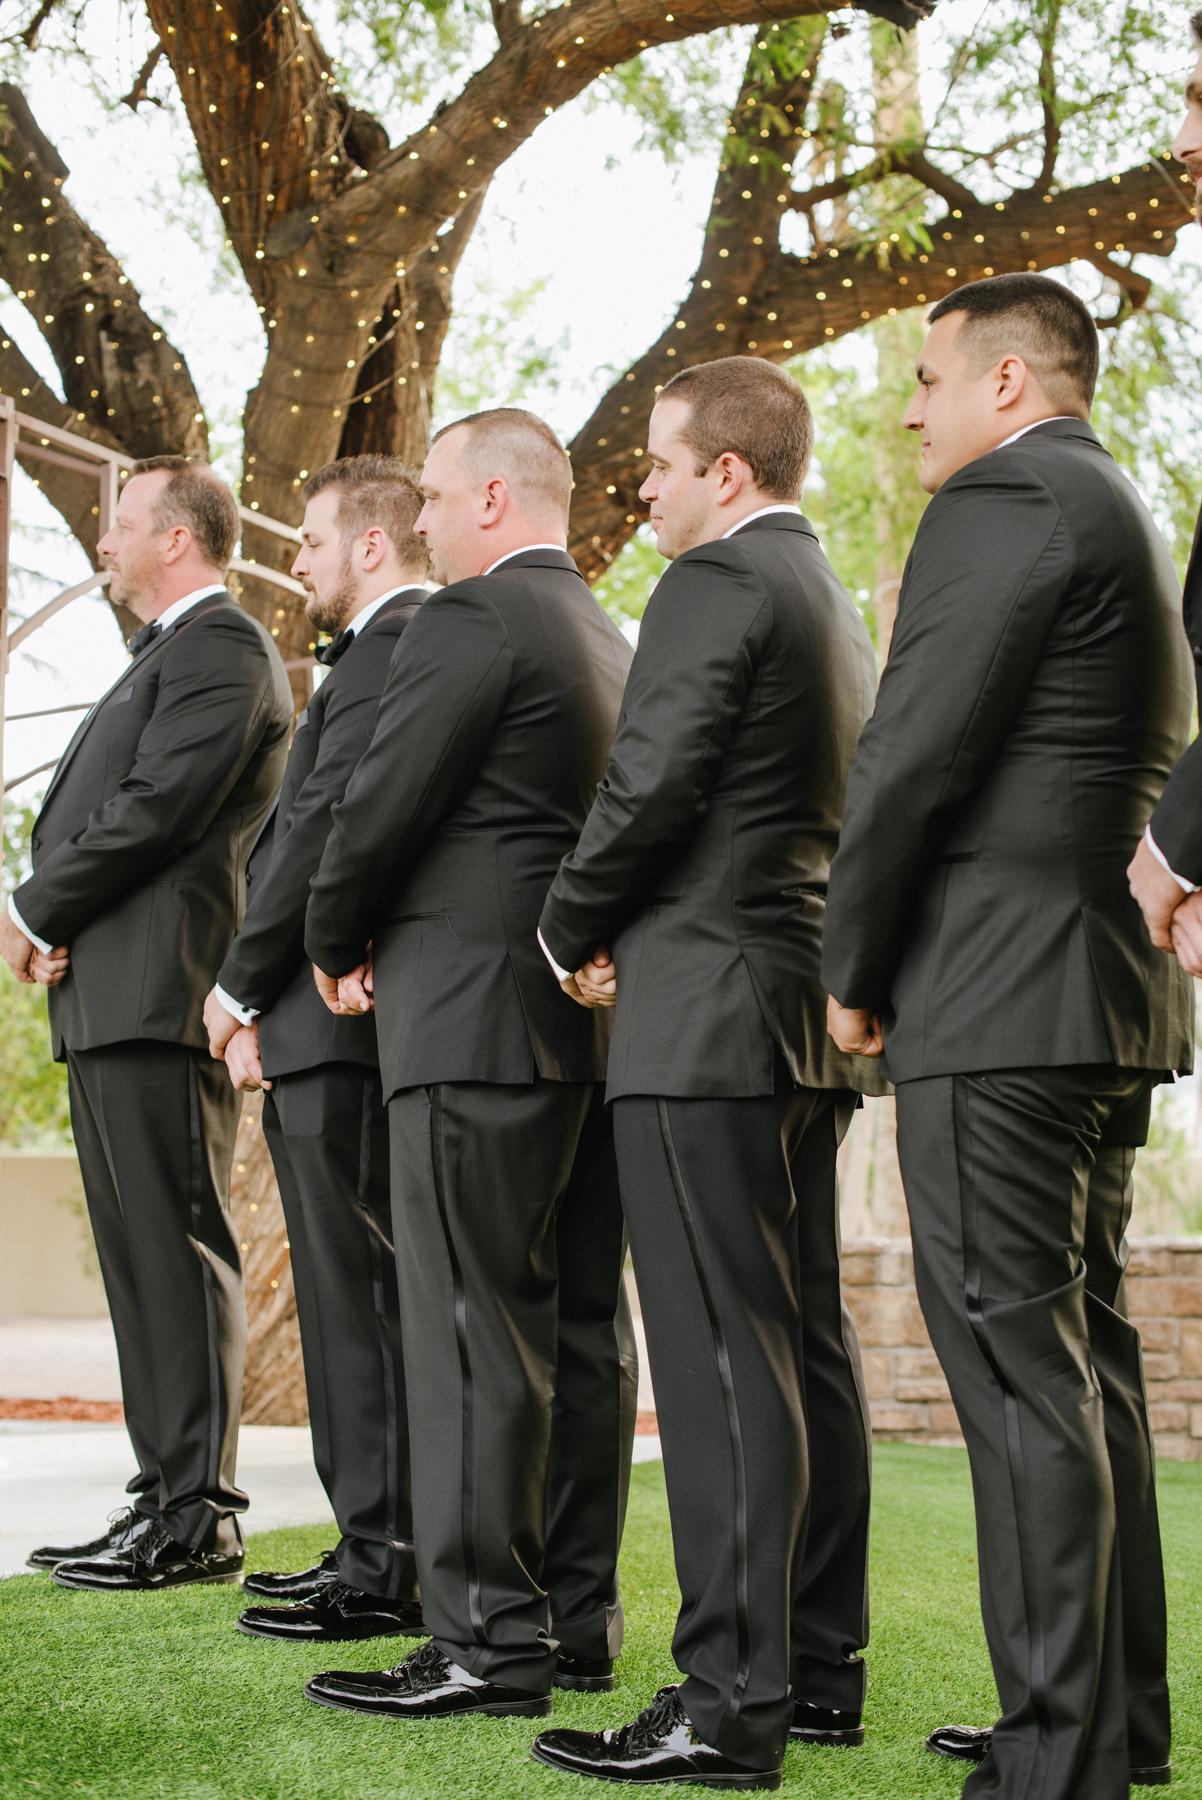 Secret Garden Event Center Wedding - Meredith Amadee Photography-96.jpg